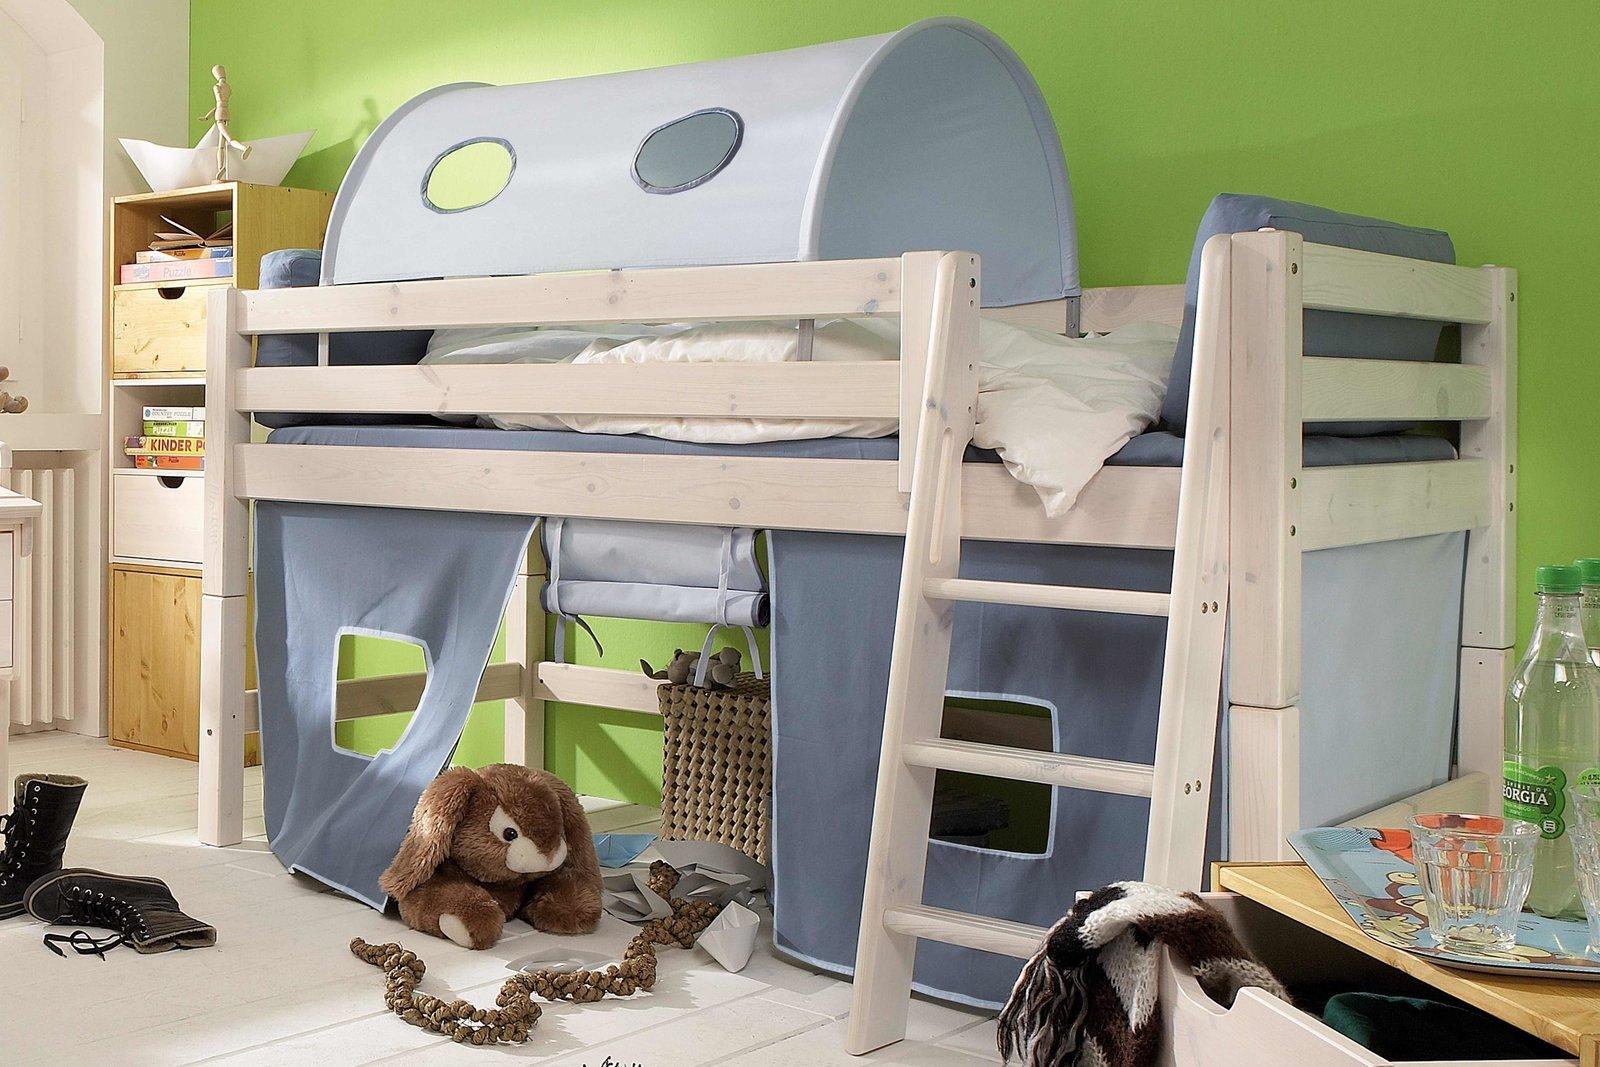 InfansKids Kinderzimmer Tiset, Bild 2